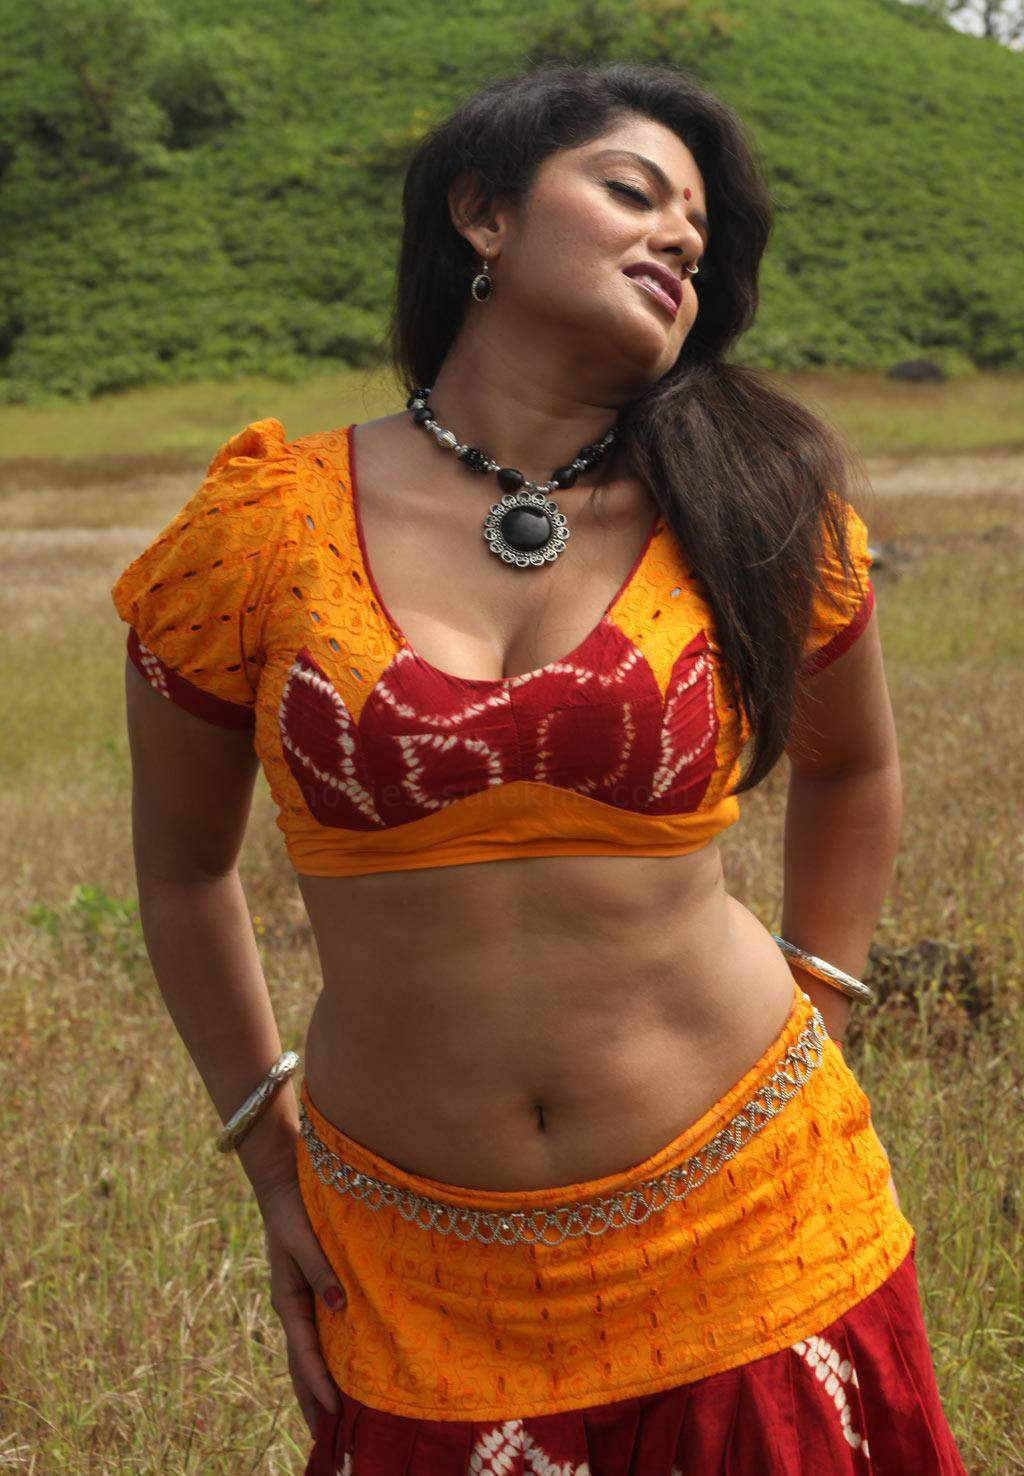 kane blog picz: wallpaper of 3 tamil movie